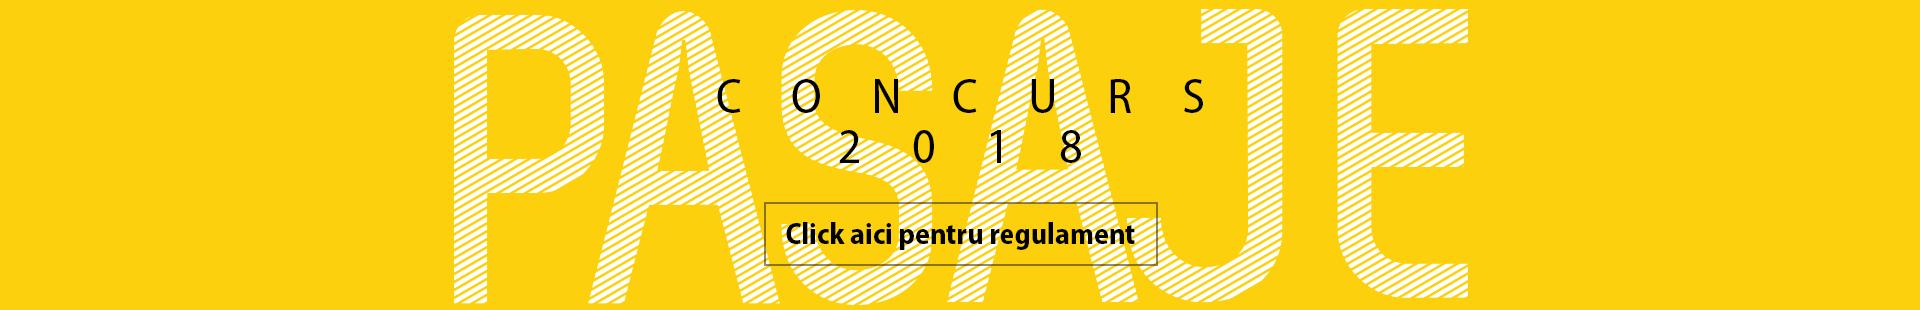 header-pasaje-2018-1